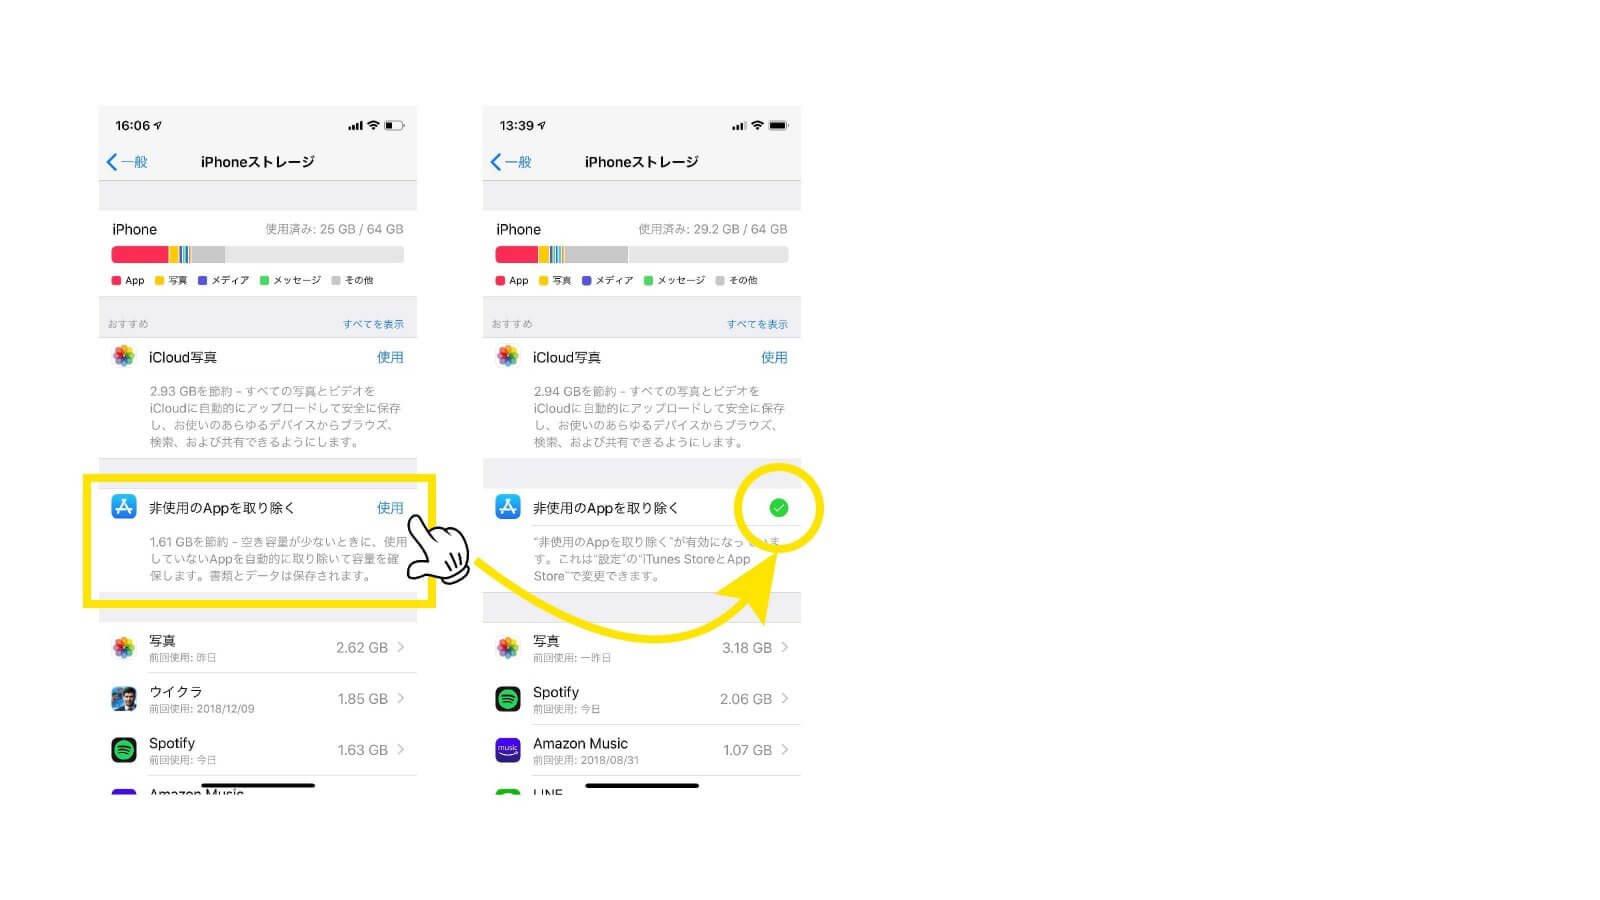 iphone操作。非使用のアプリをまとめて取り除く方法。